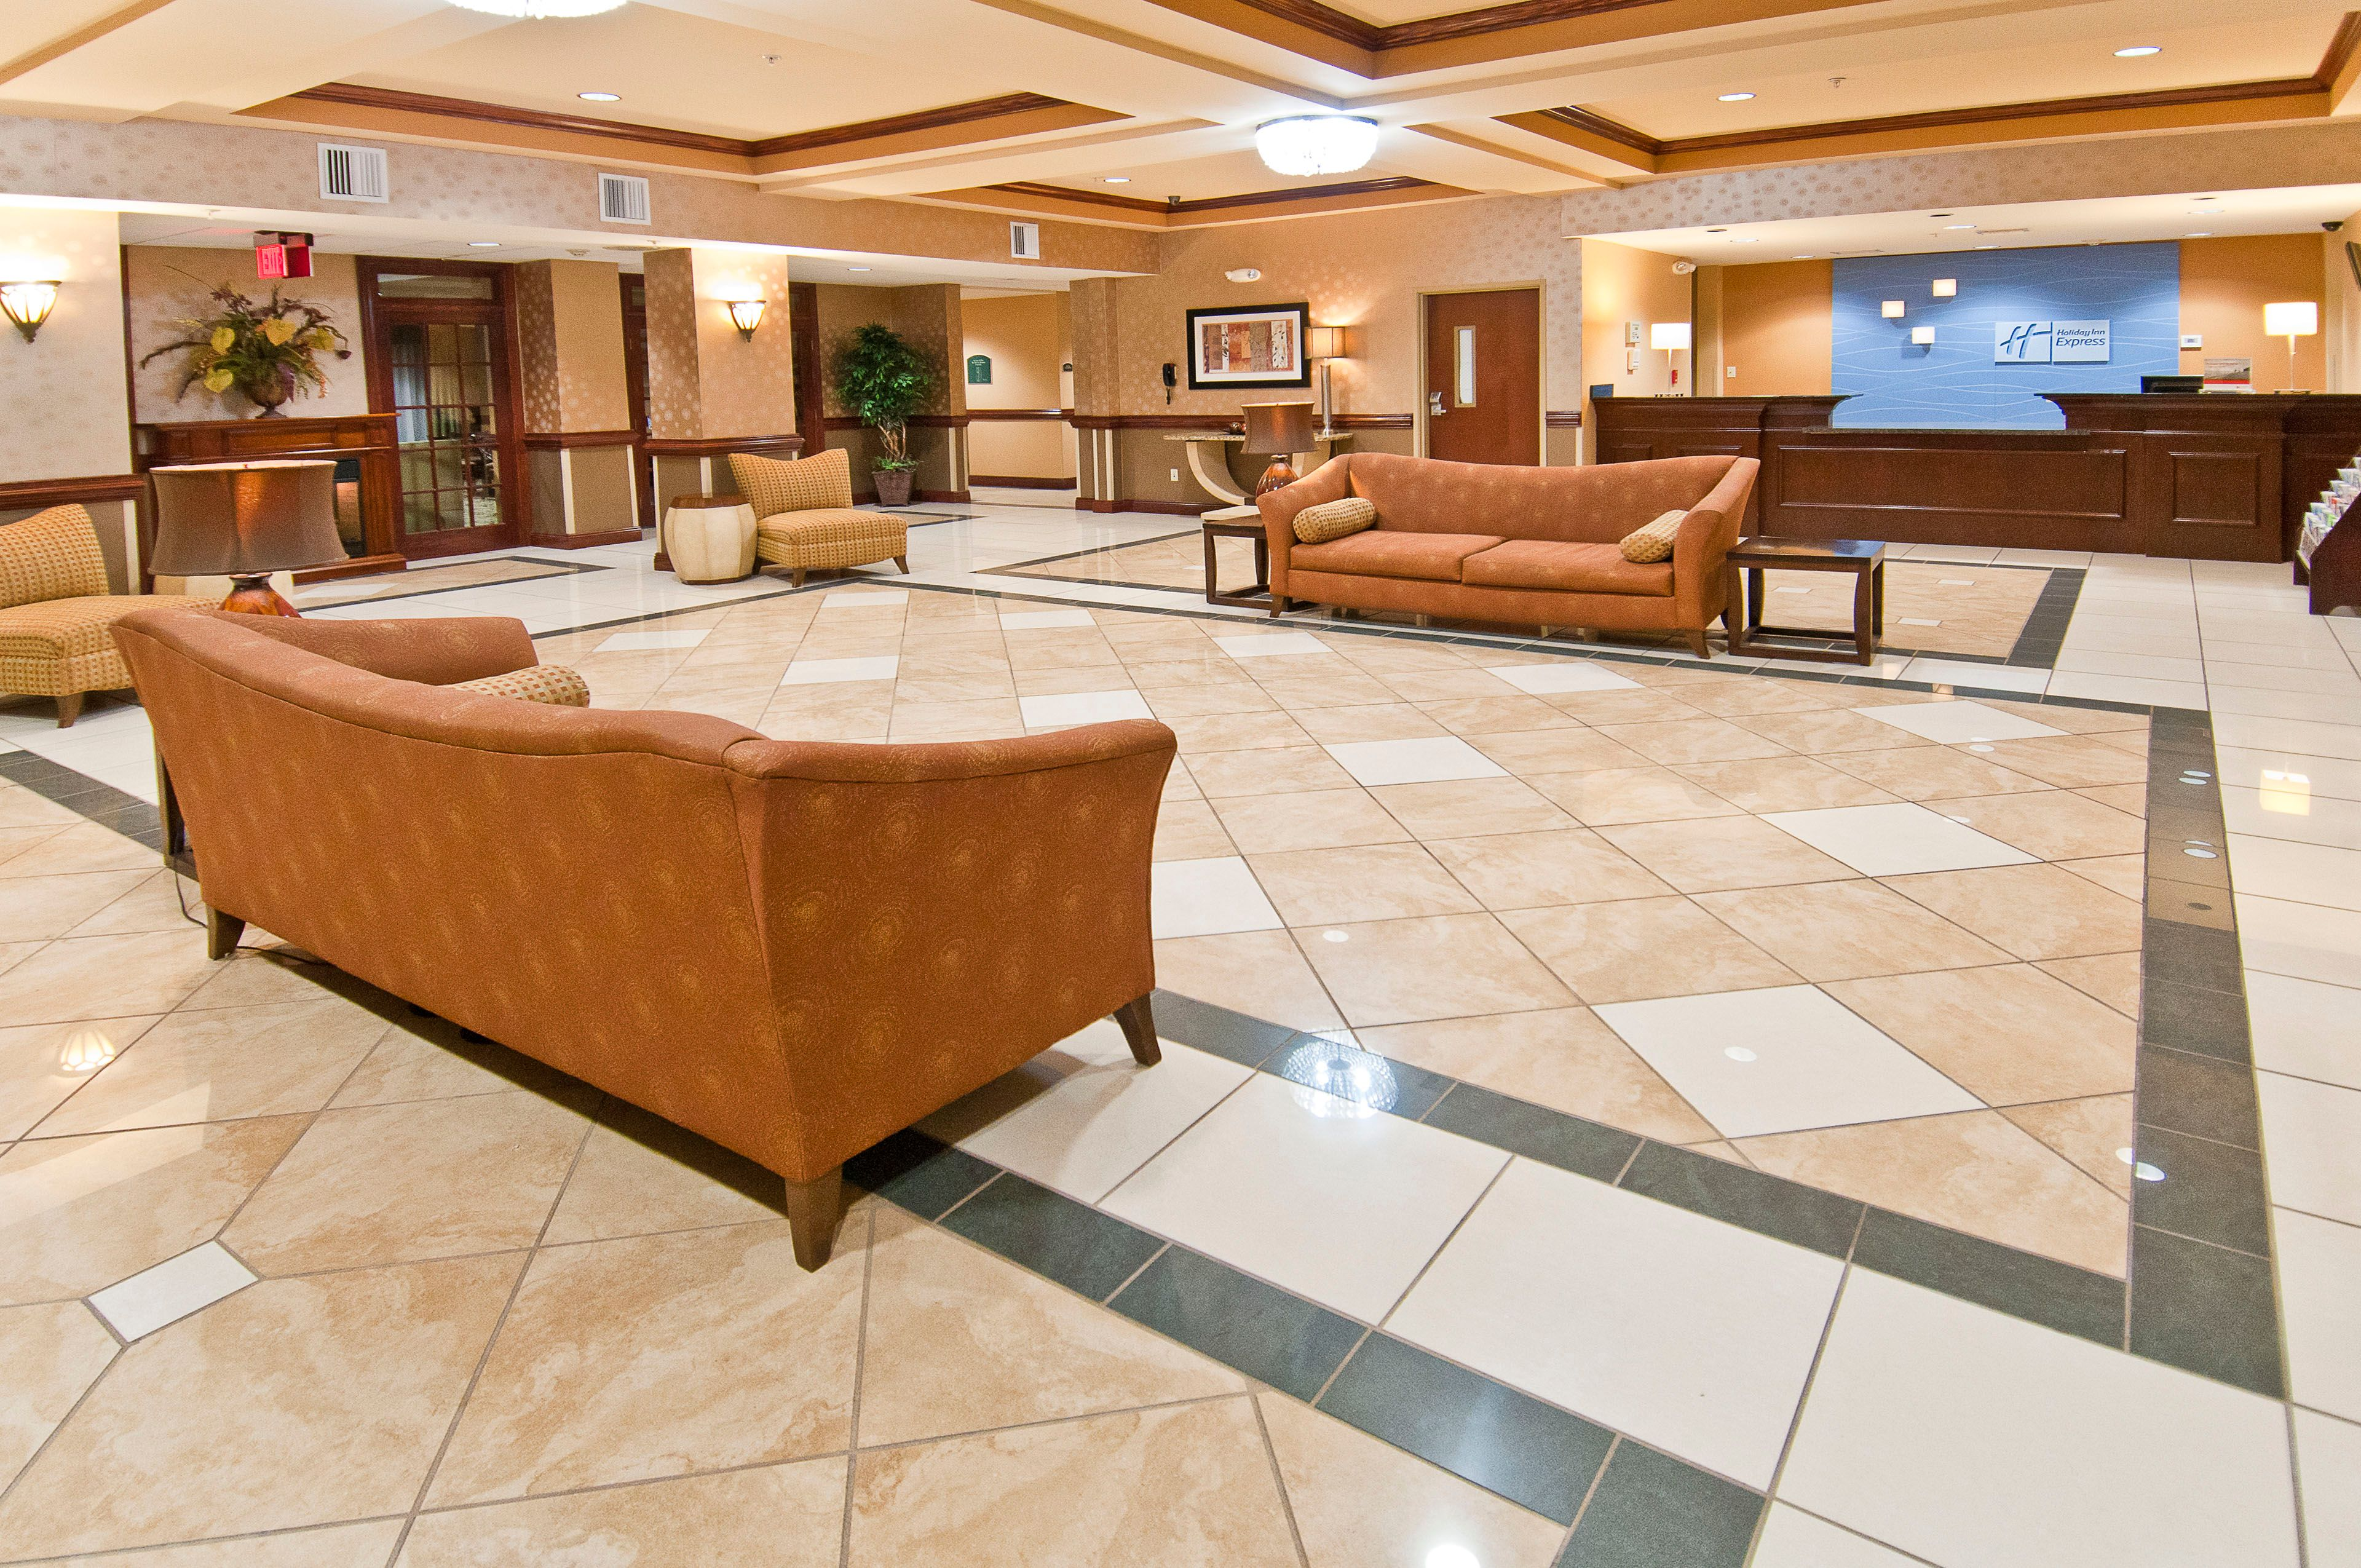 Holiday Inn Express & Suites Biloxi- Ocean Springs image 7